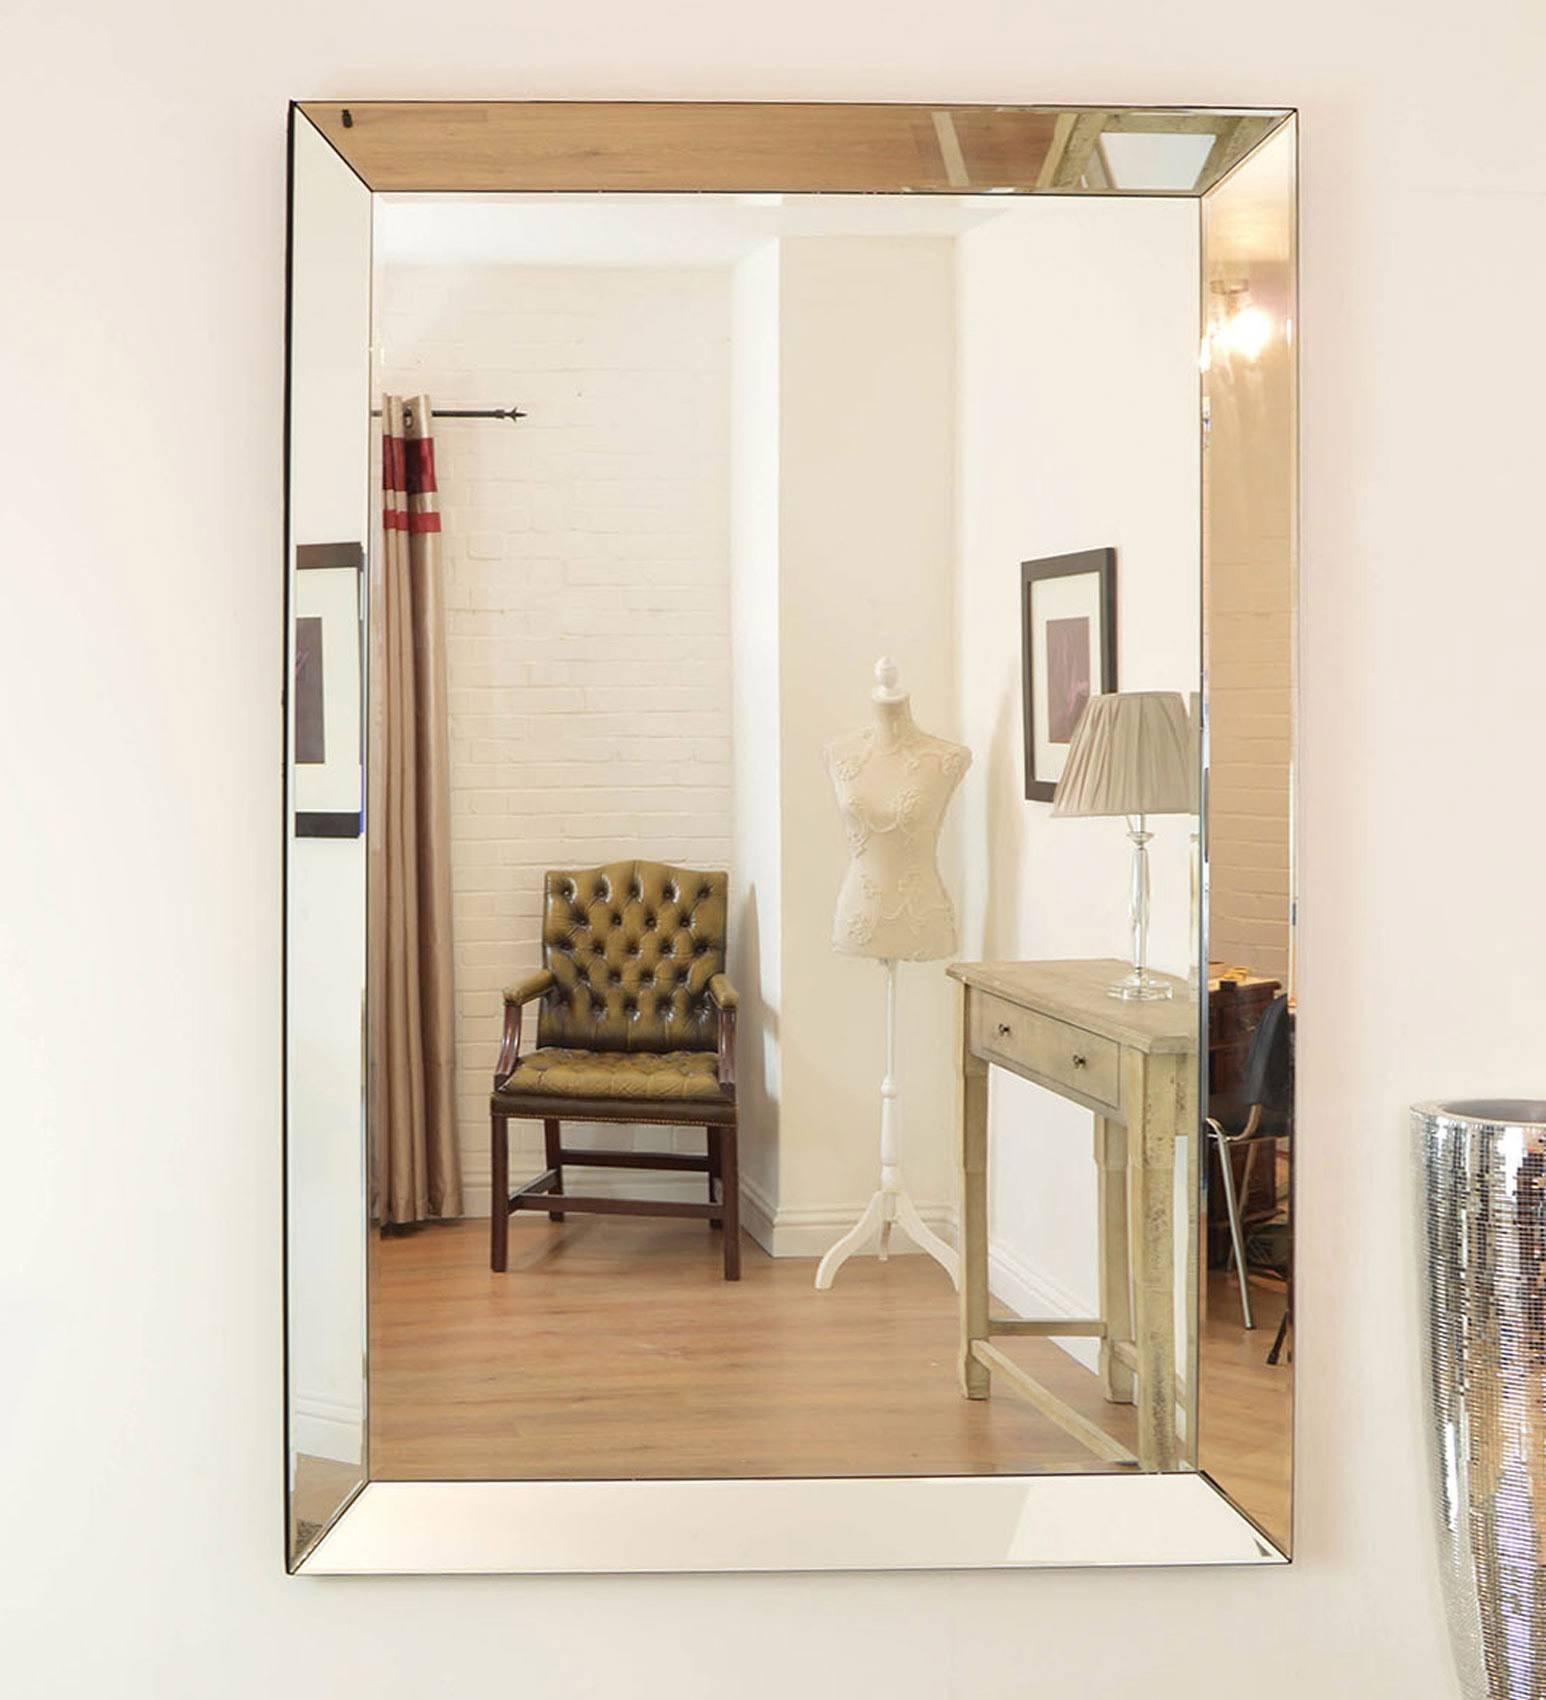 Frameless Wall Mirror Design And Ideas | Vwho Inside Large Frameless Wall Mirrors (View 3 of 25)